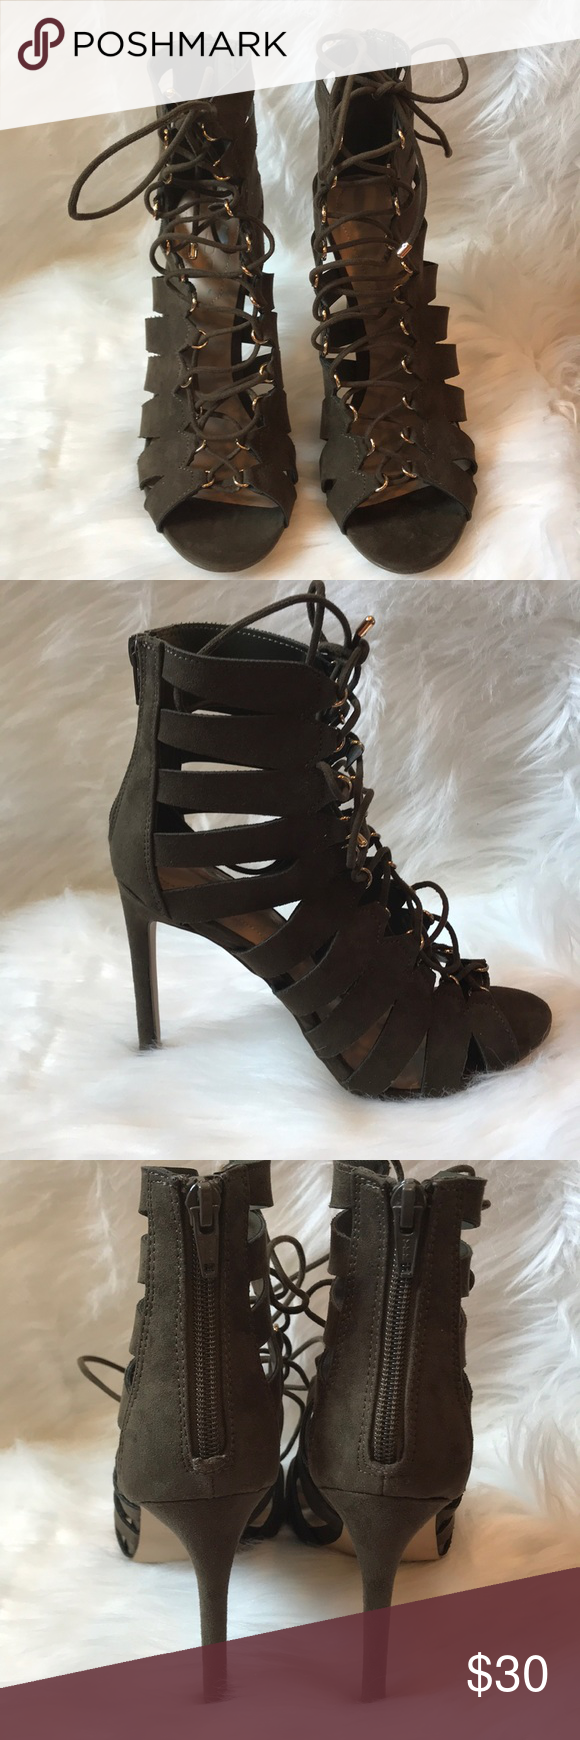 Heels for dark green dress  NWT Aldo Sorenza dress sandals NWT  My Posh Closet  Pinterest